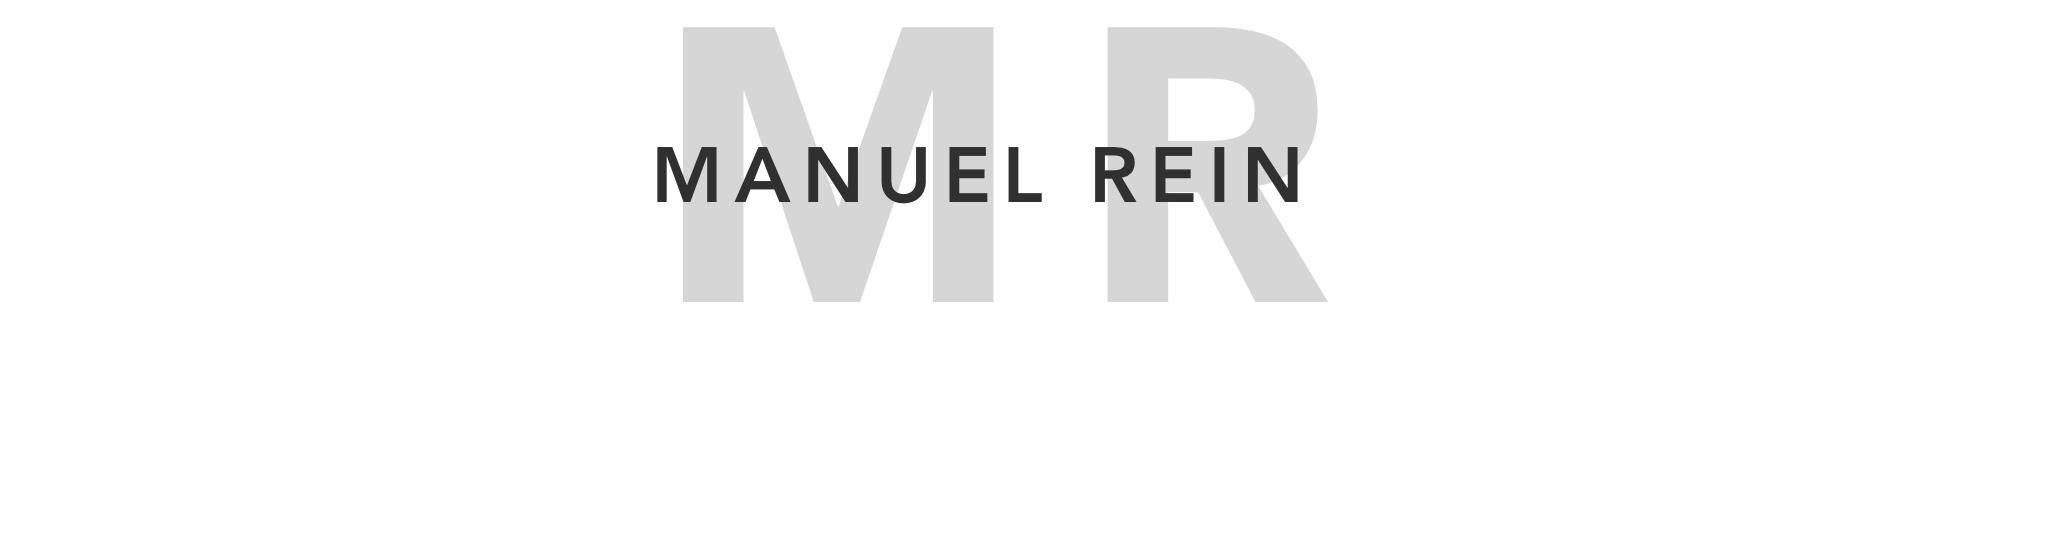 manuel-rein-mesana-corporacion-v3